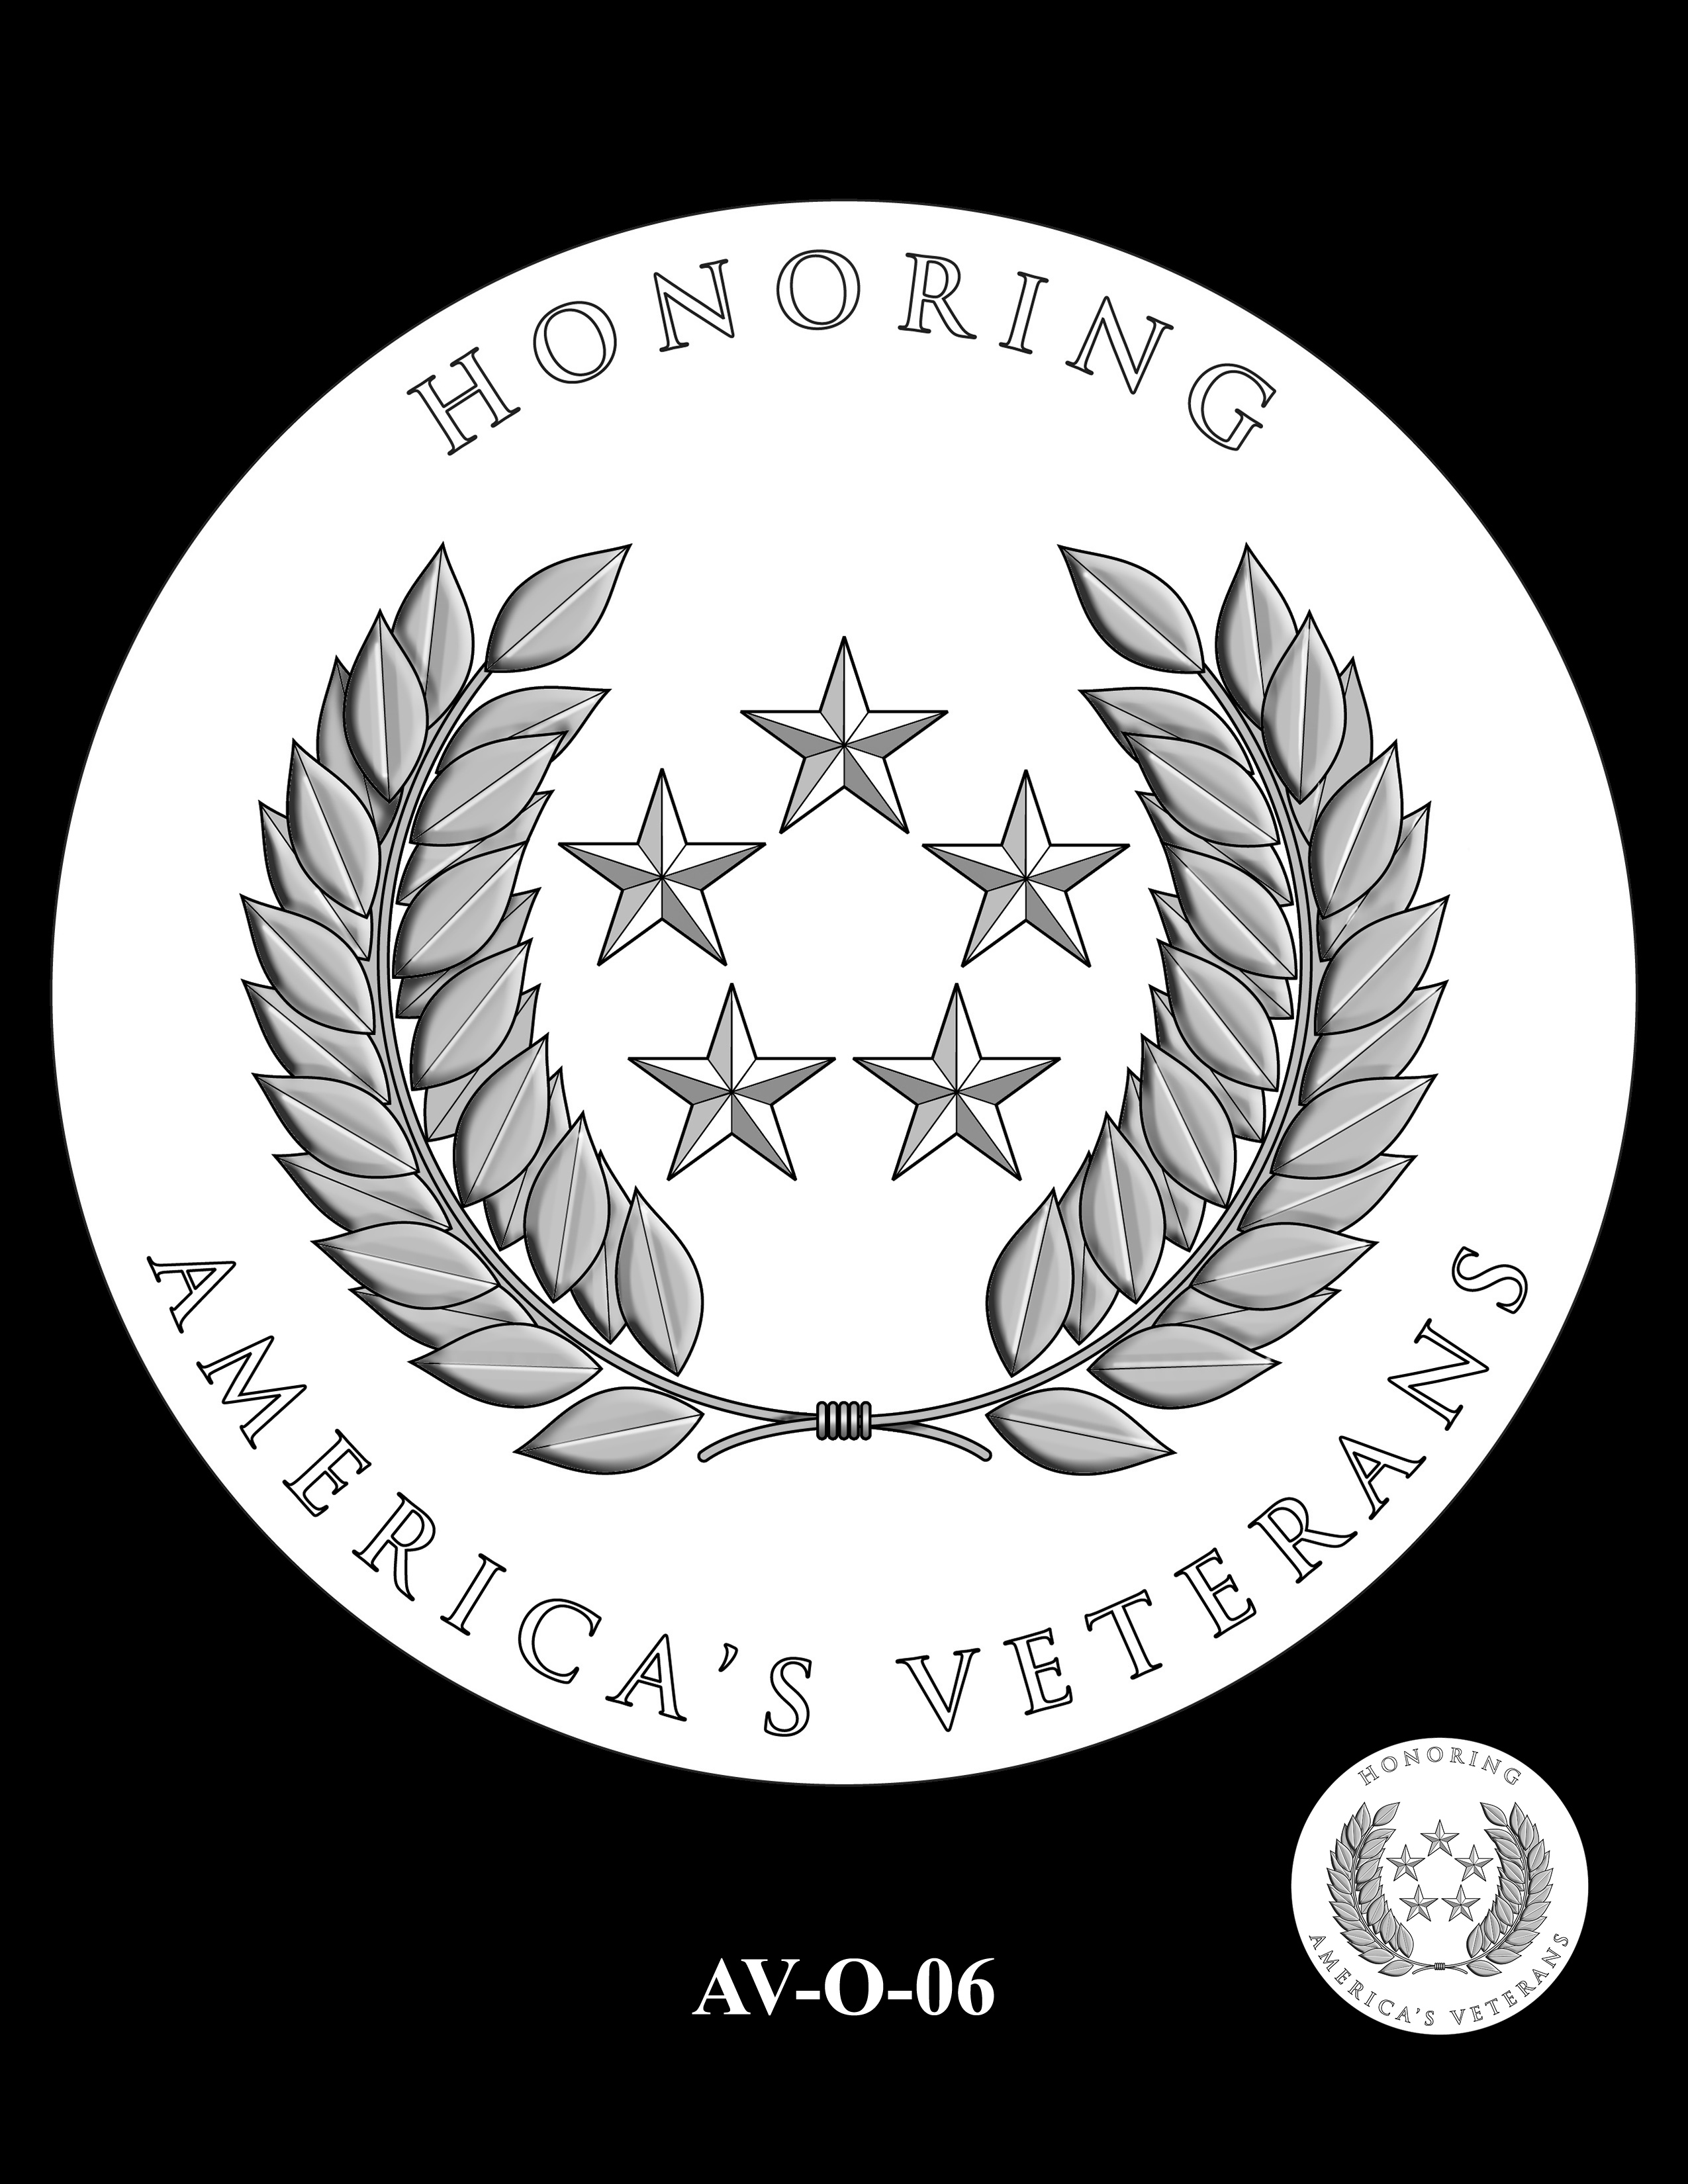 AV-O-06 - American Veterans Medal